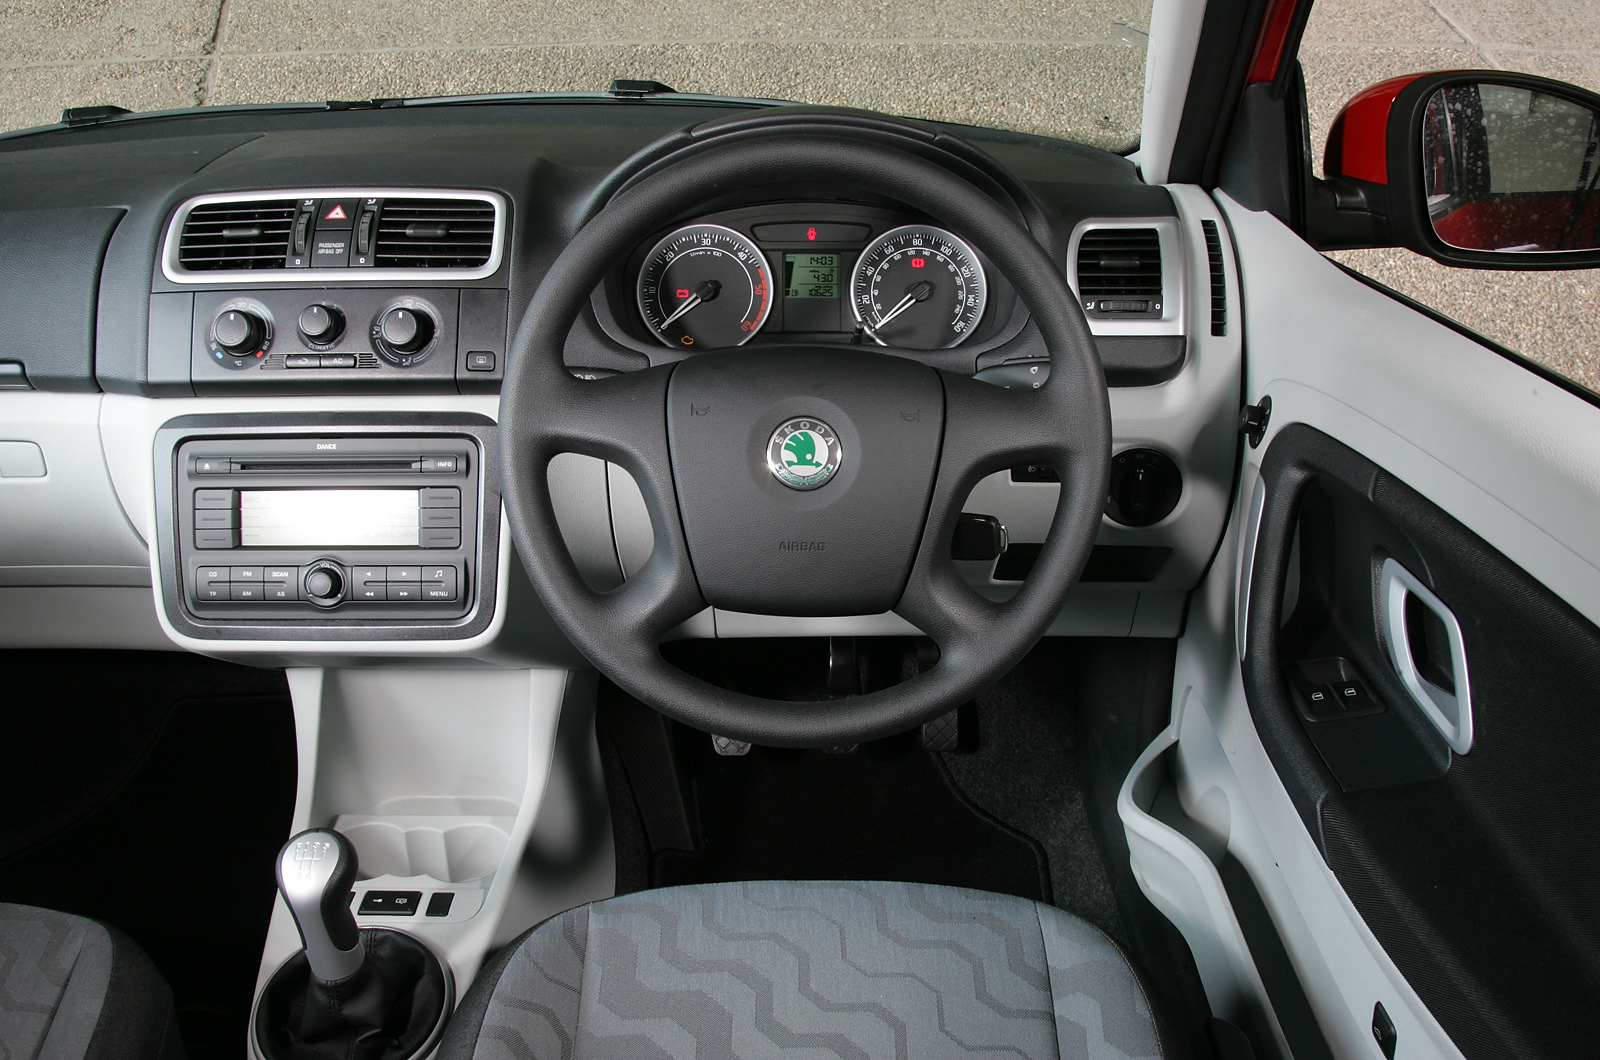 Skoda Fabia 2007 2014 Interior Autocar